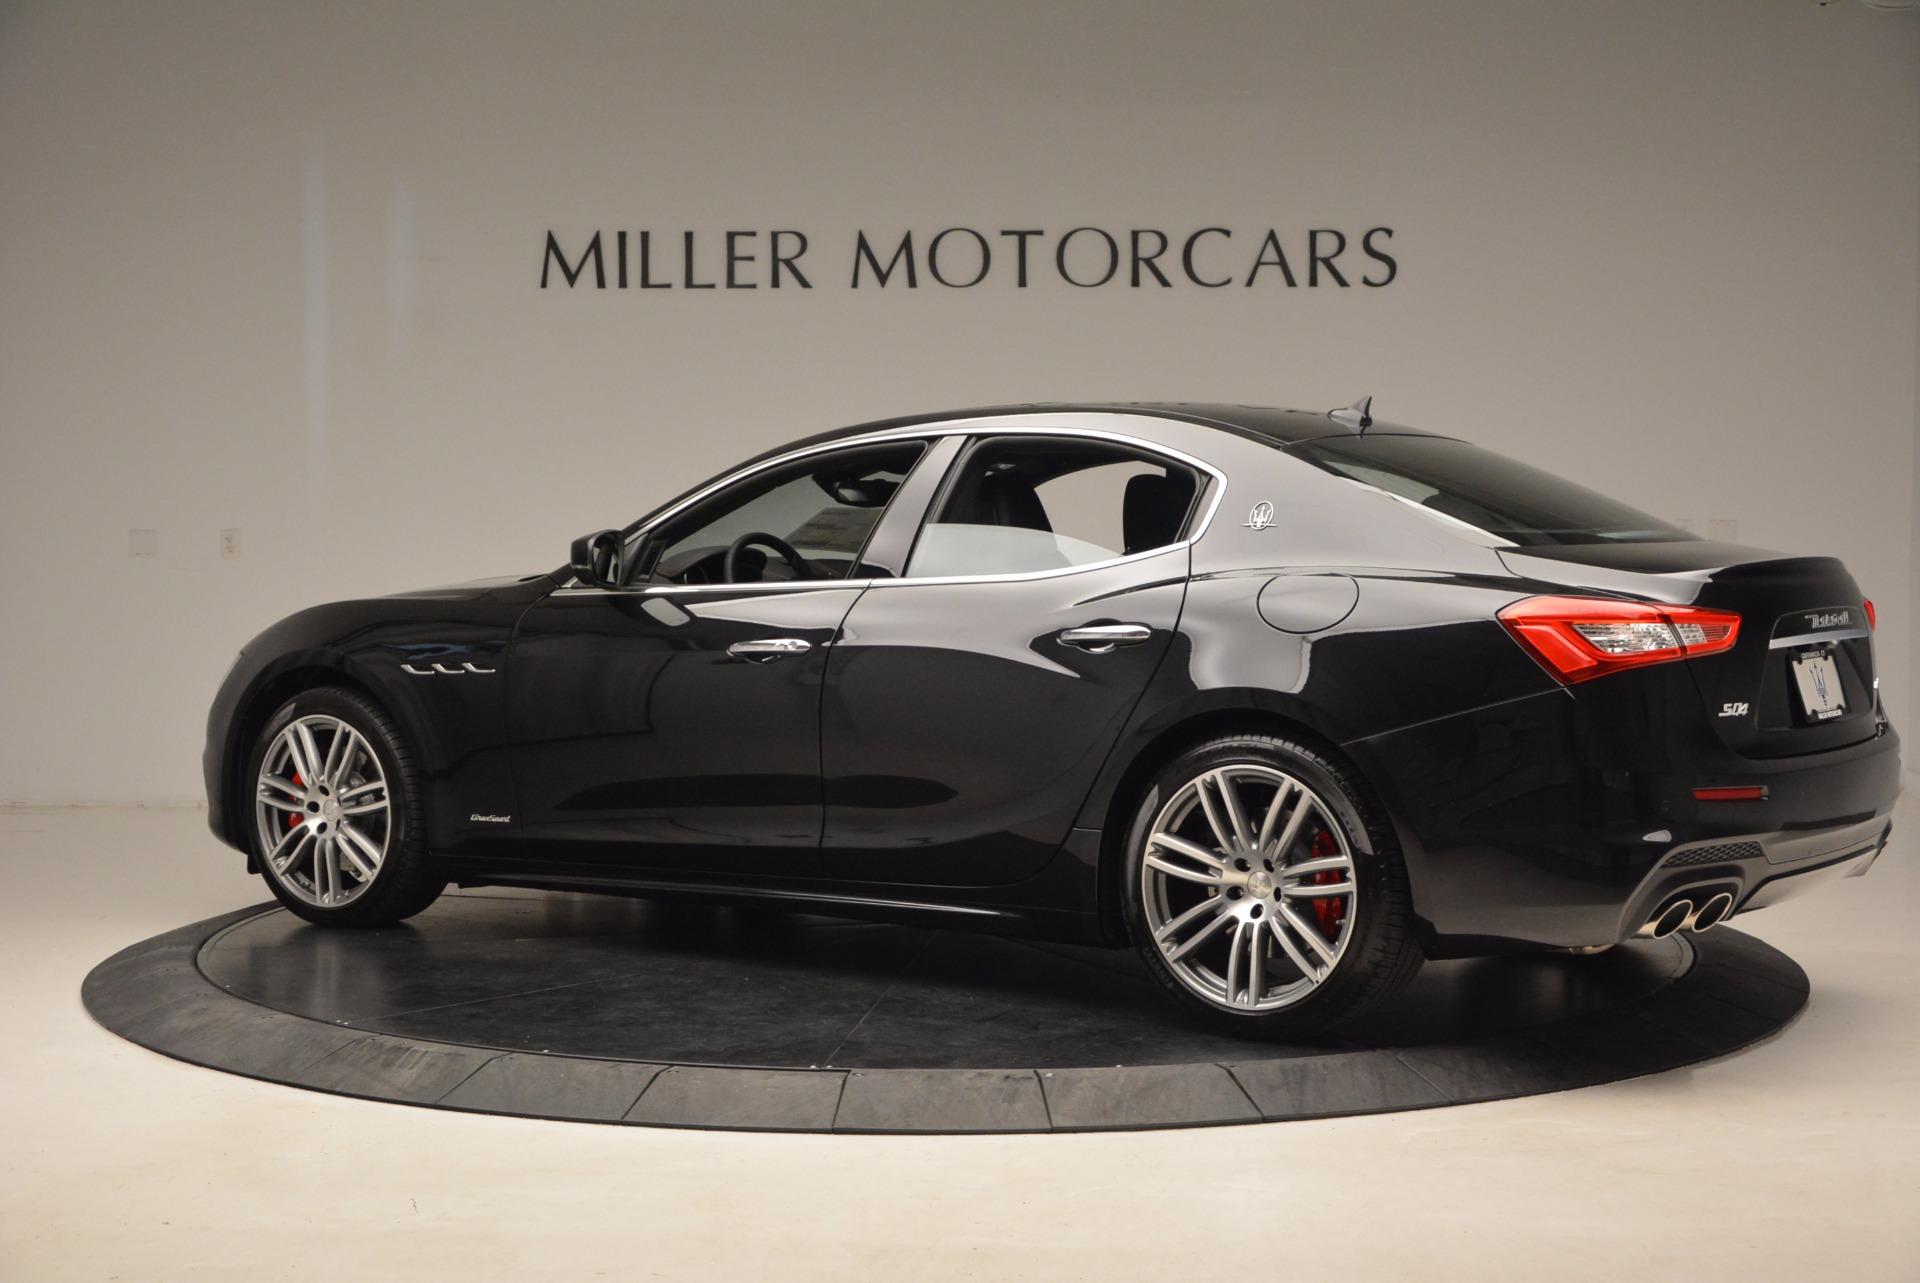 New 2018 Maserati Ghibli S Q4 Gransport For Sale In Greenwich, CT 1855_p4